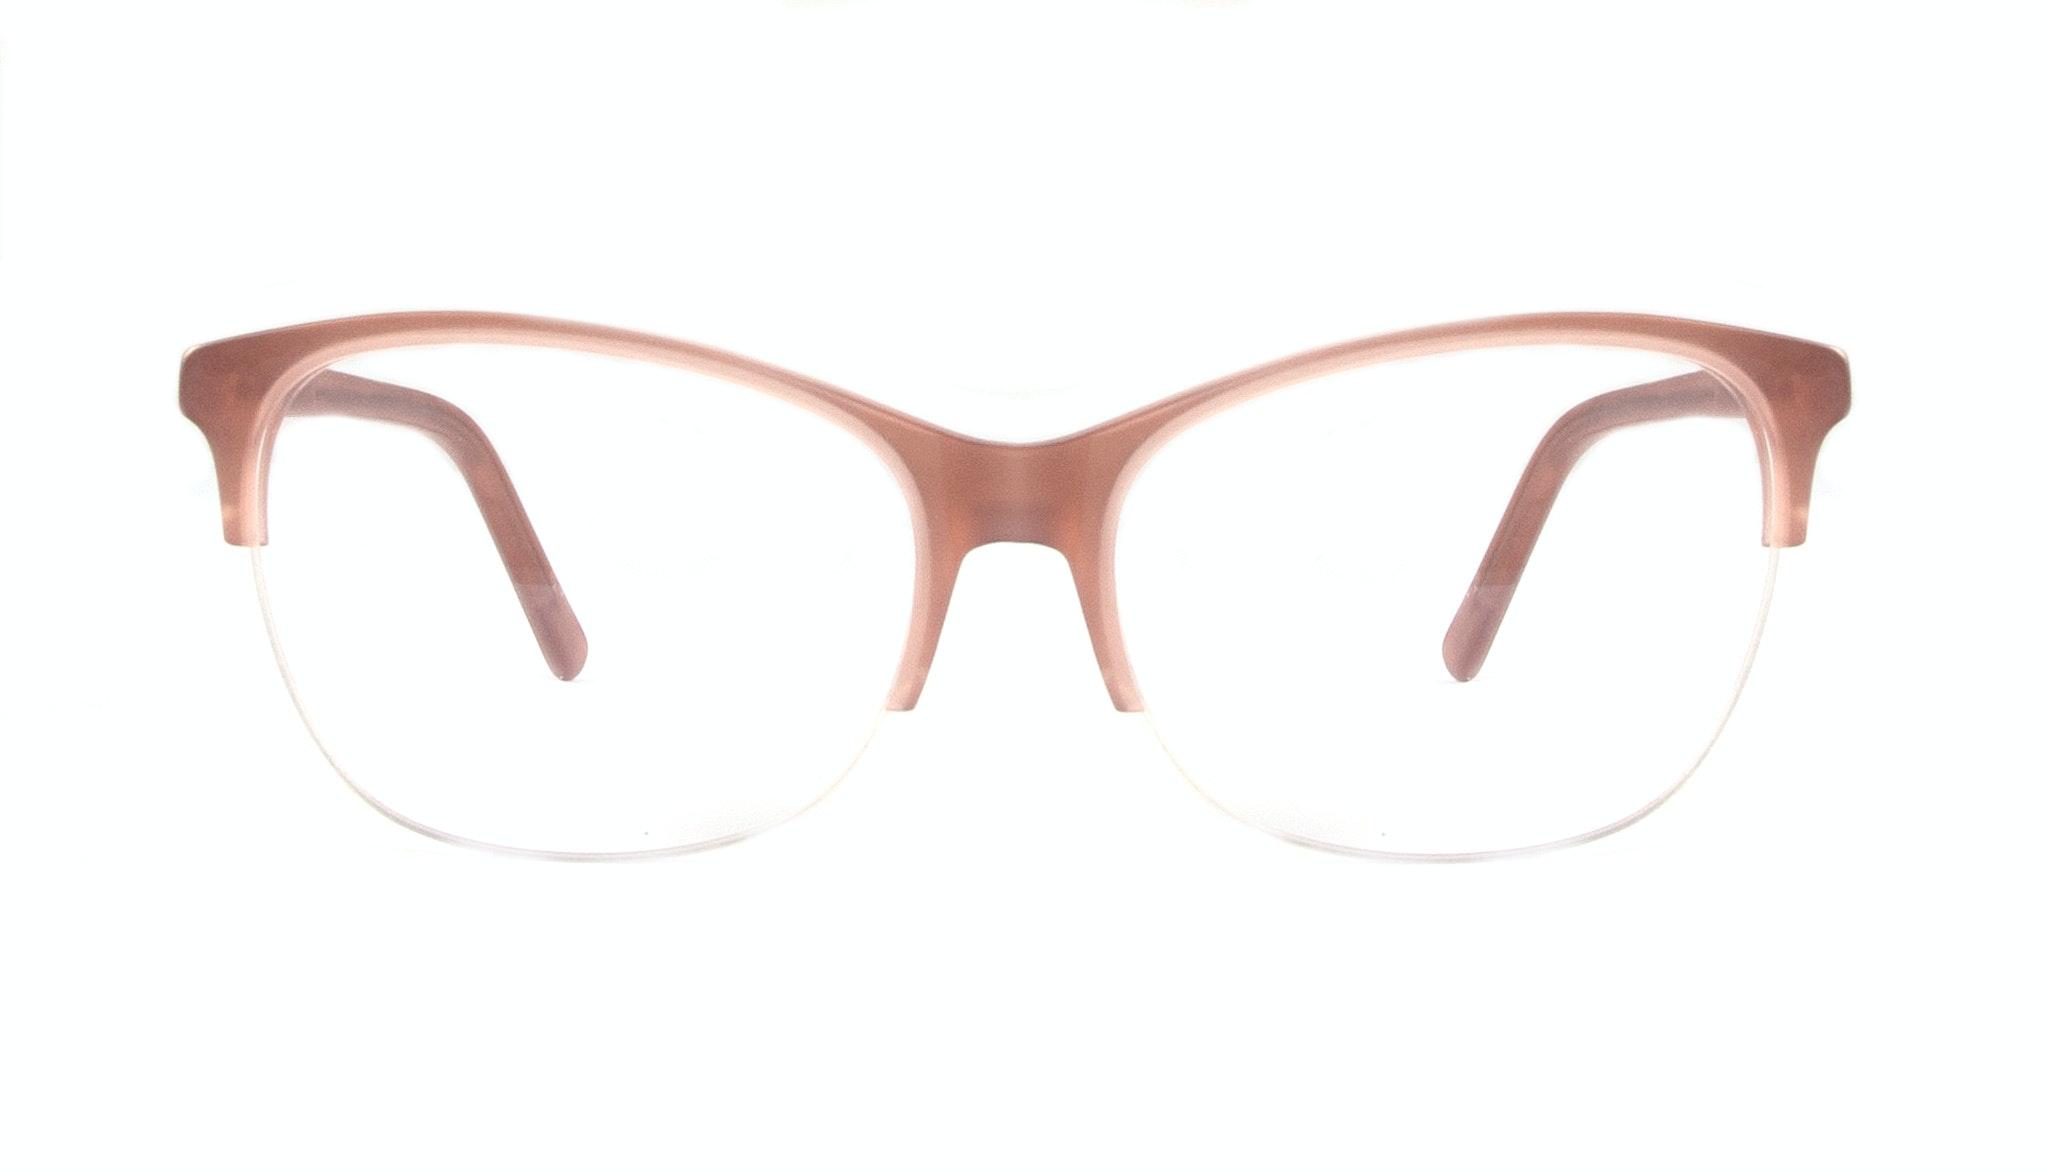 Affordable Fashion Glasses Cat Eye Rectangle Semi-Rimless Eyeglasses Women Flair Light Old Rose Front